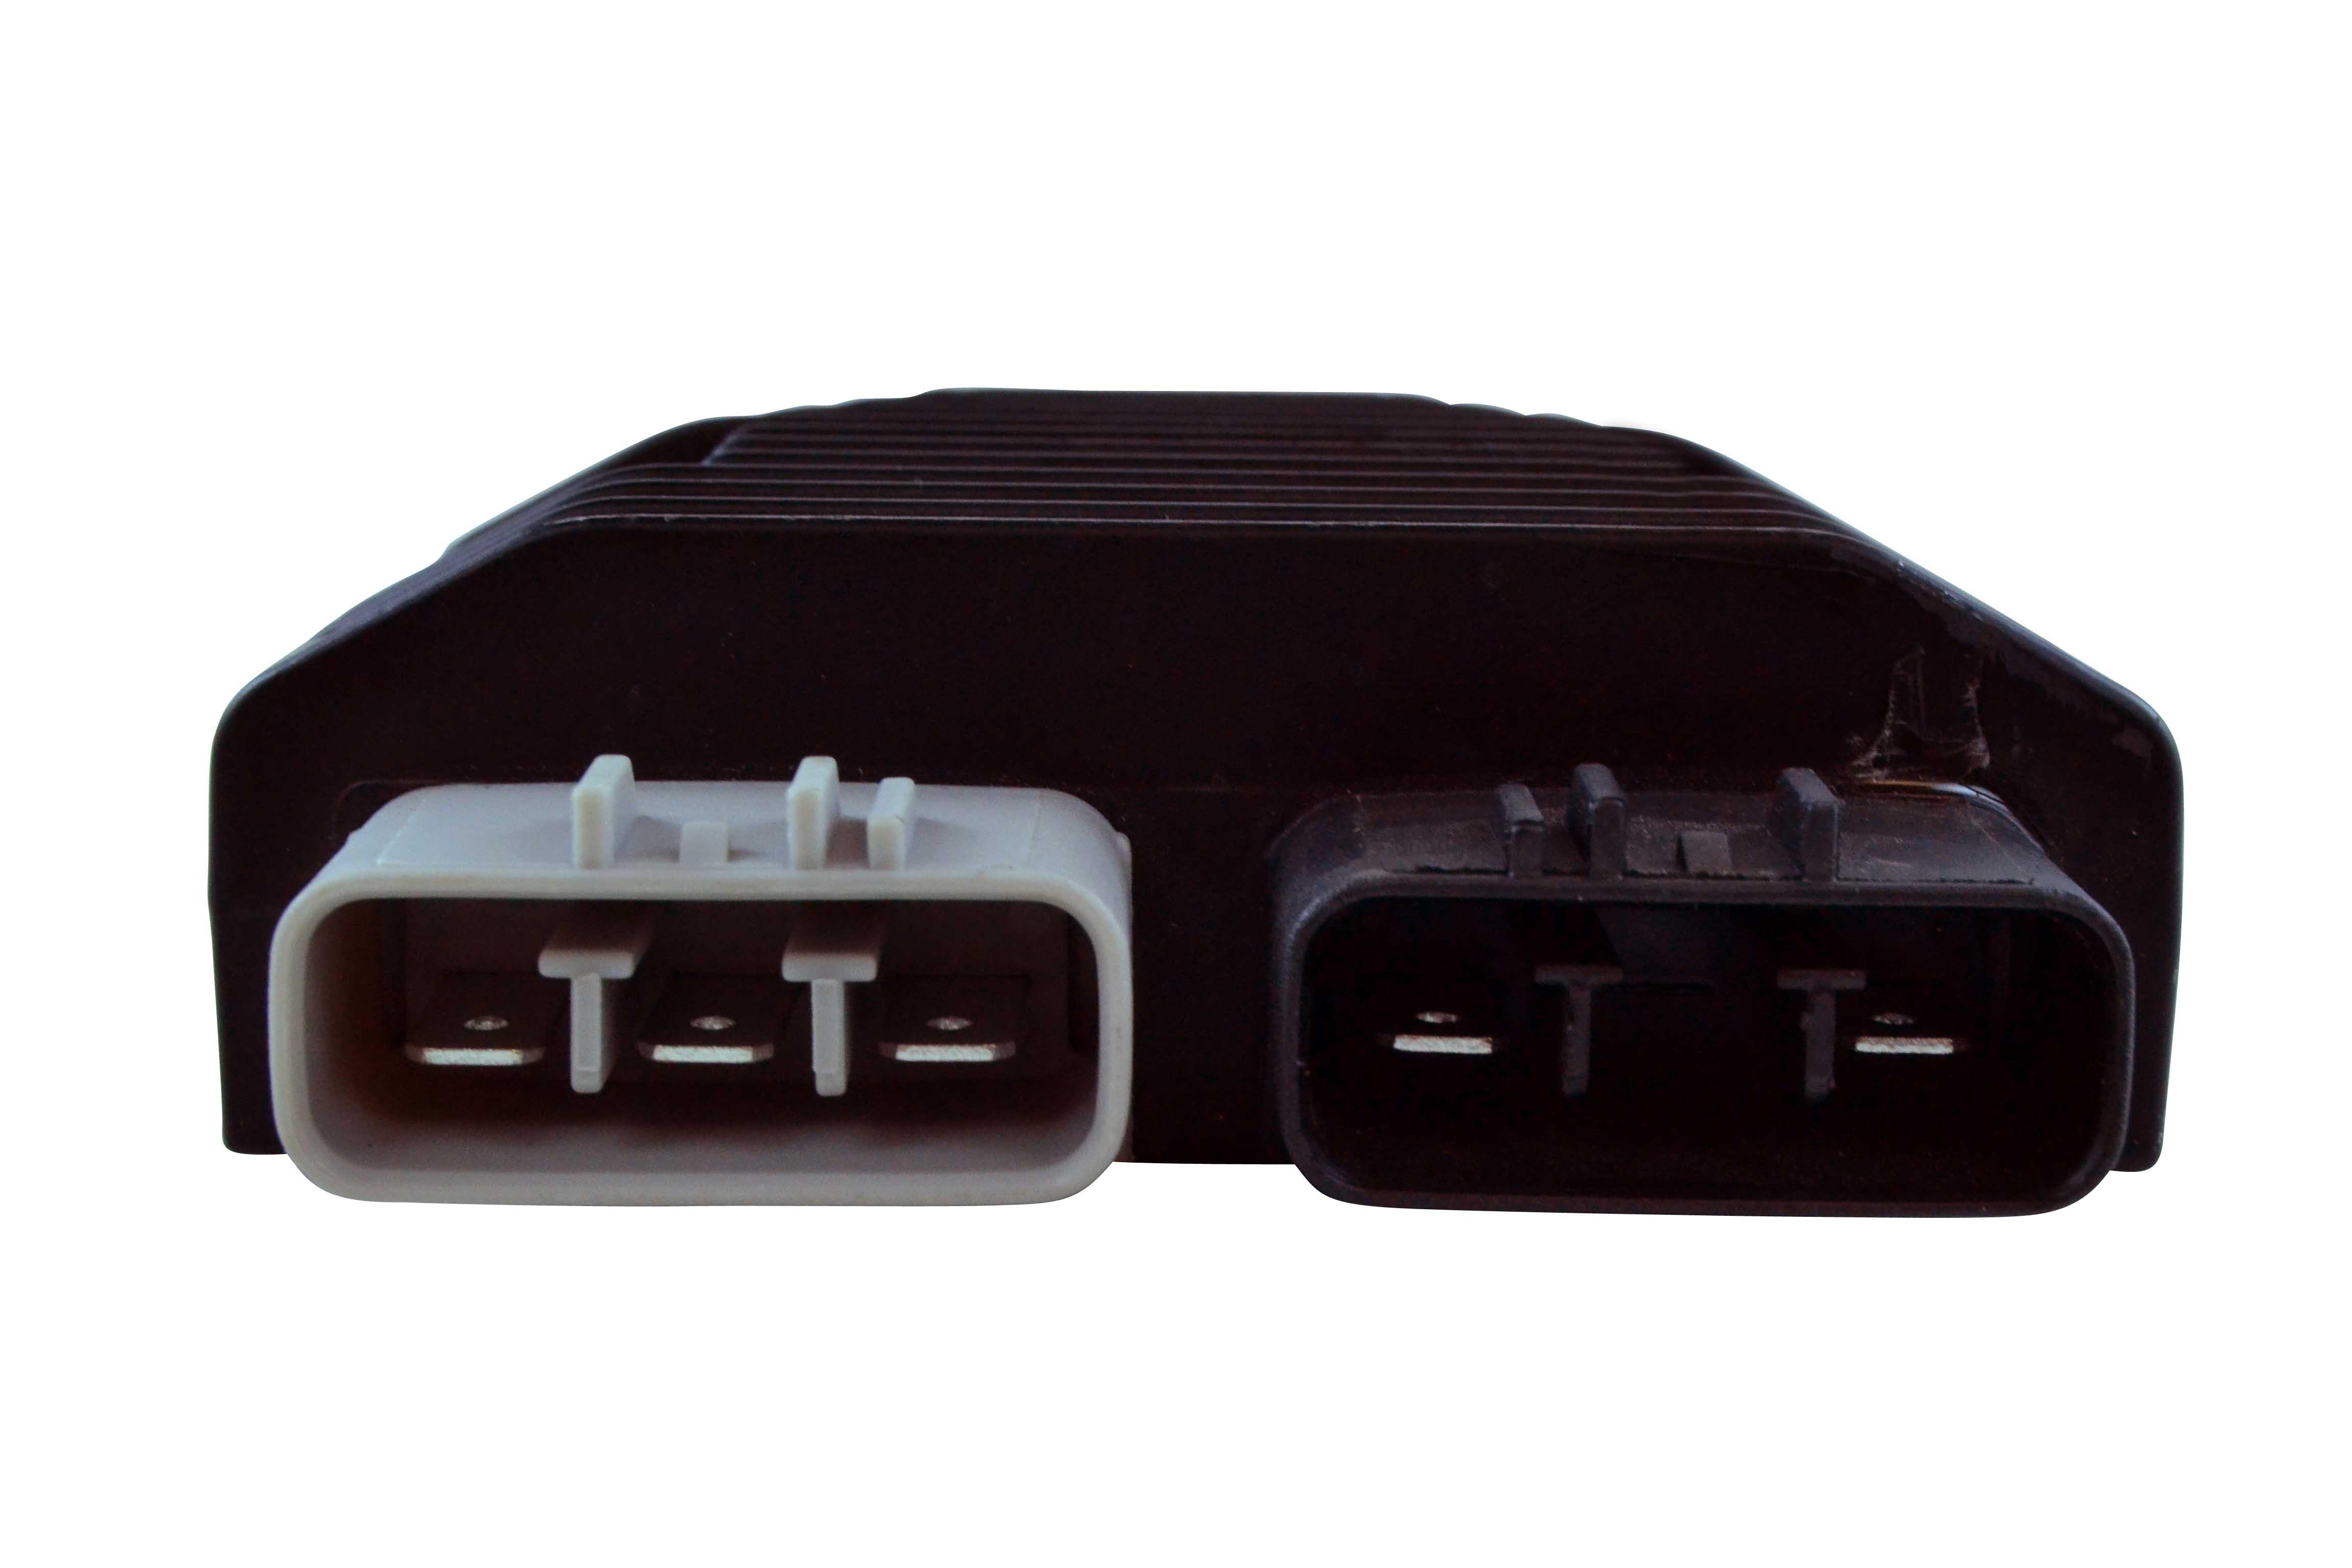 Lithium-Ion Batteries Compatible Mosfet Voltage Regulator